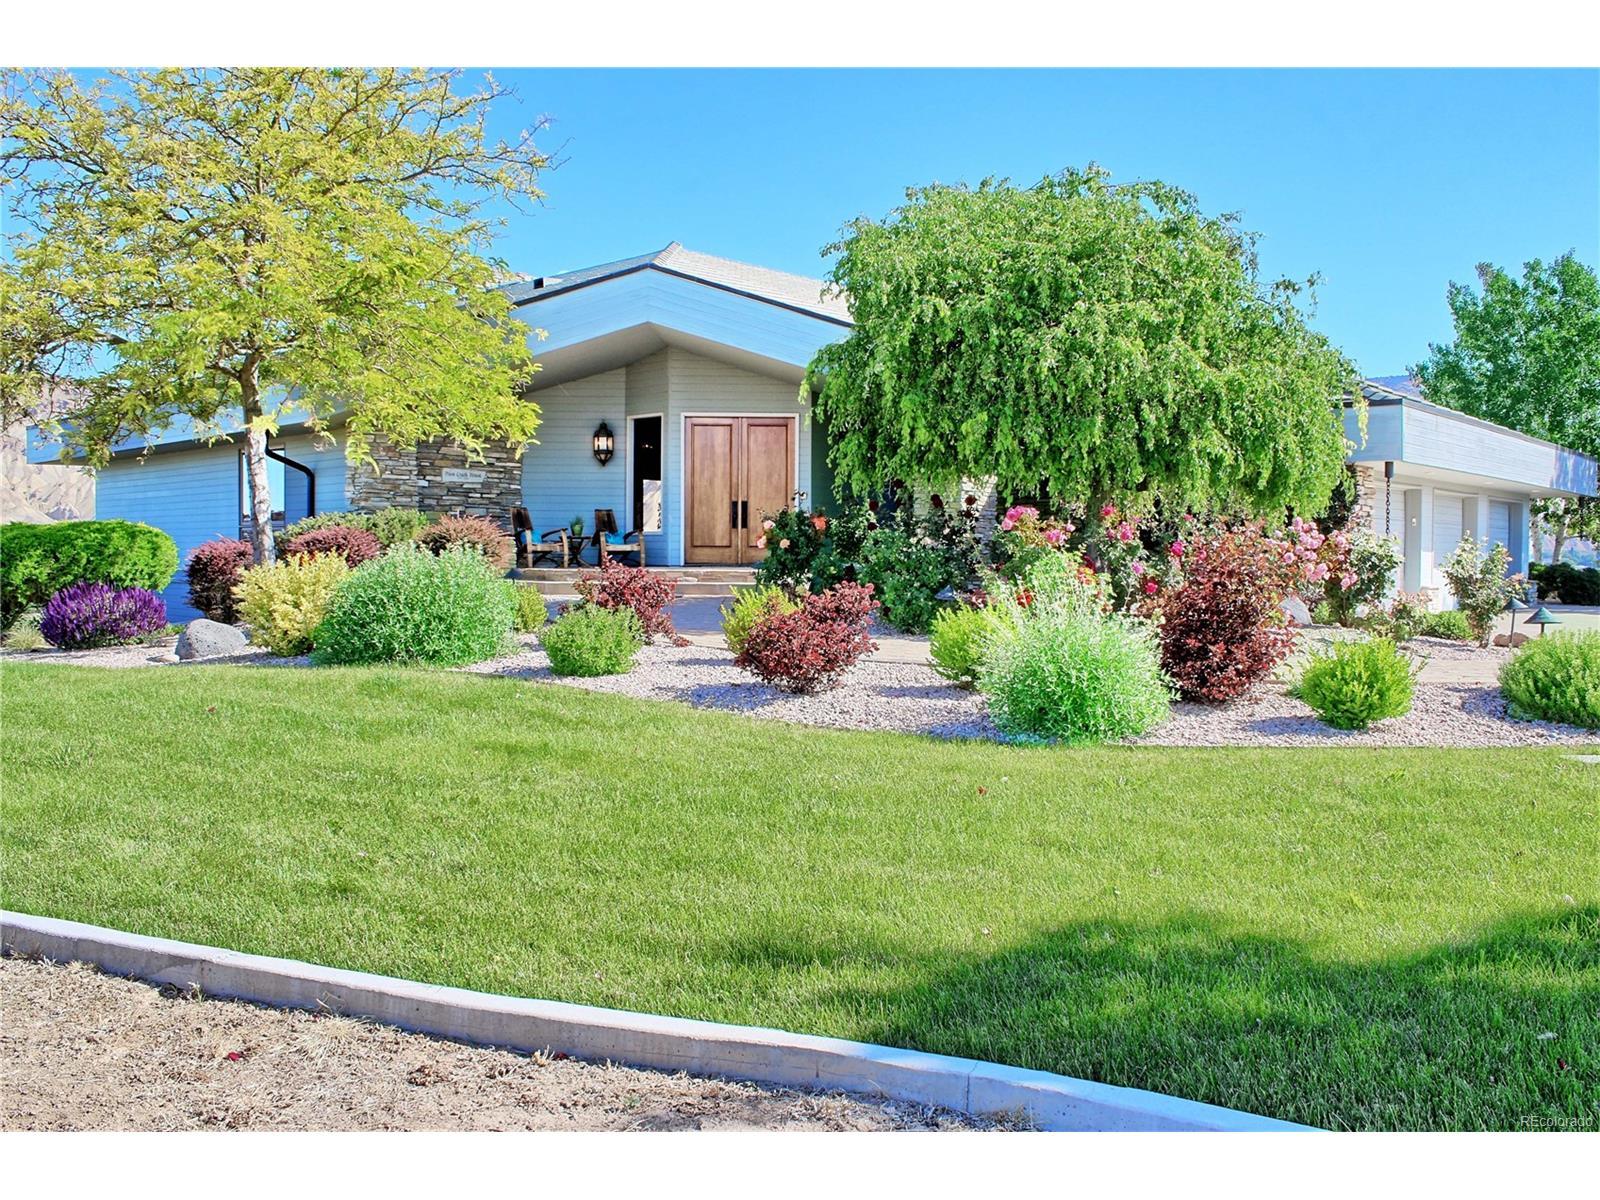 3626 F Road, Palisade, CO 81526 - Palisade, CO real estate listing